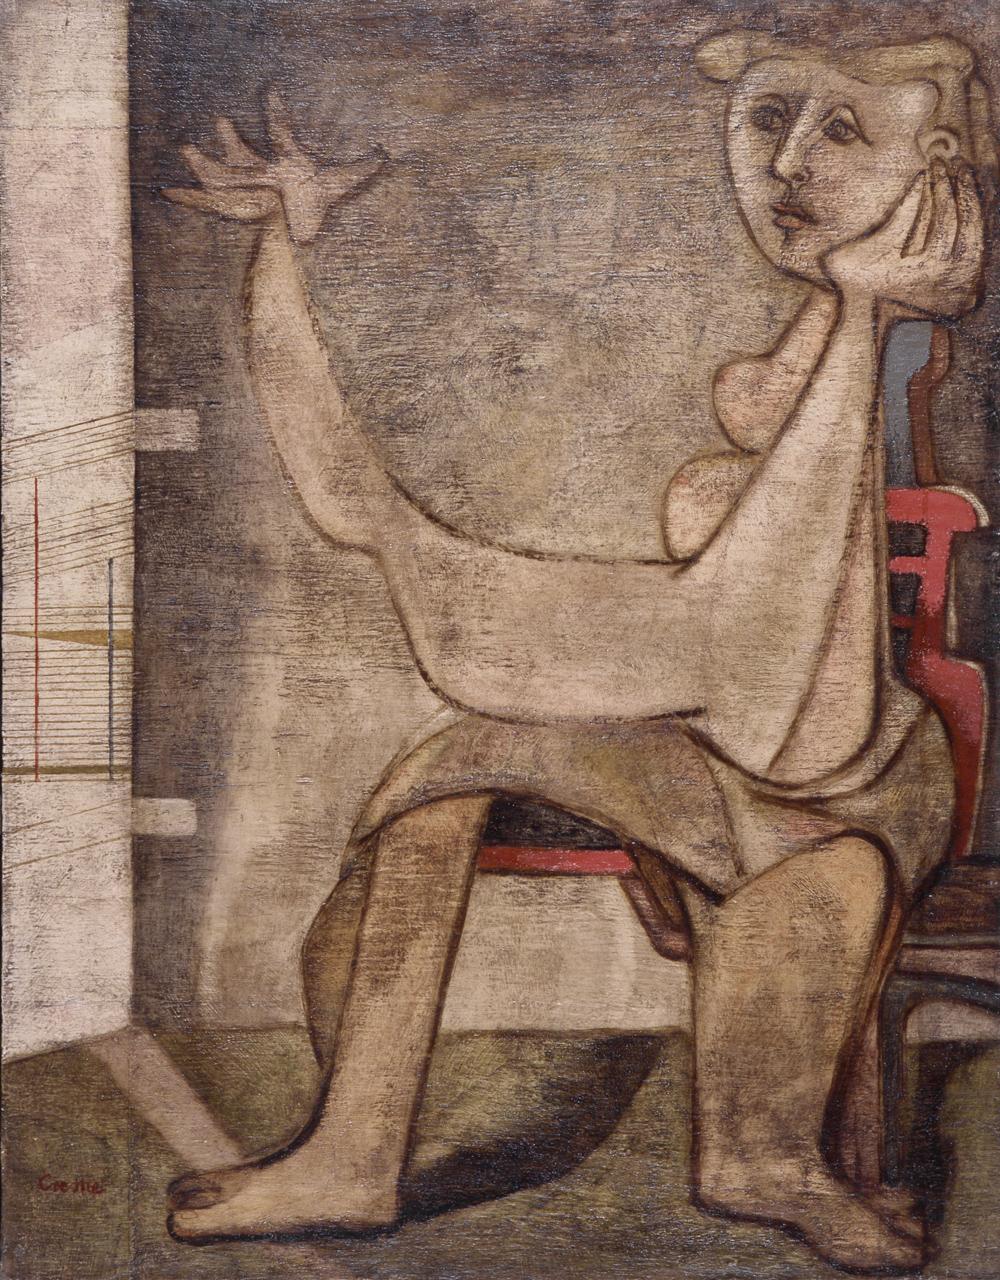 Benjamin Creme: Sybilline Figure (1943).